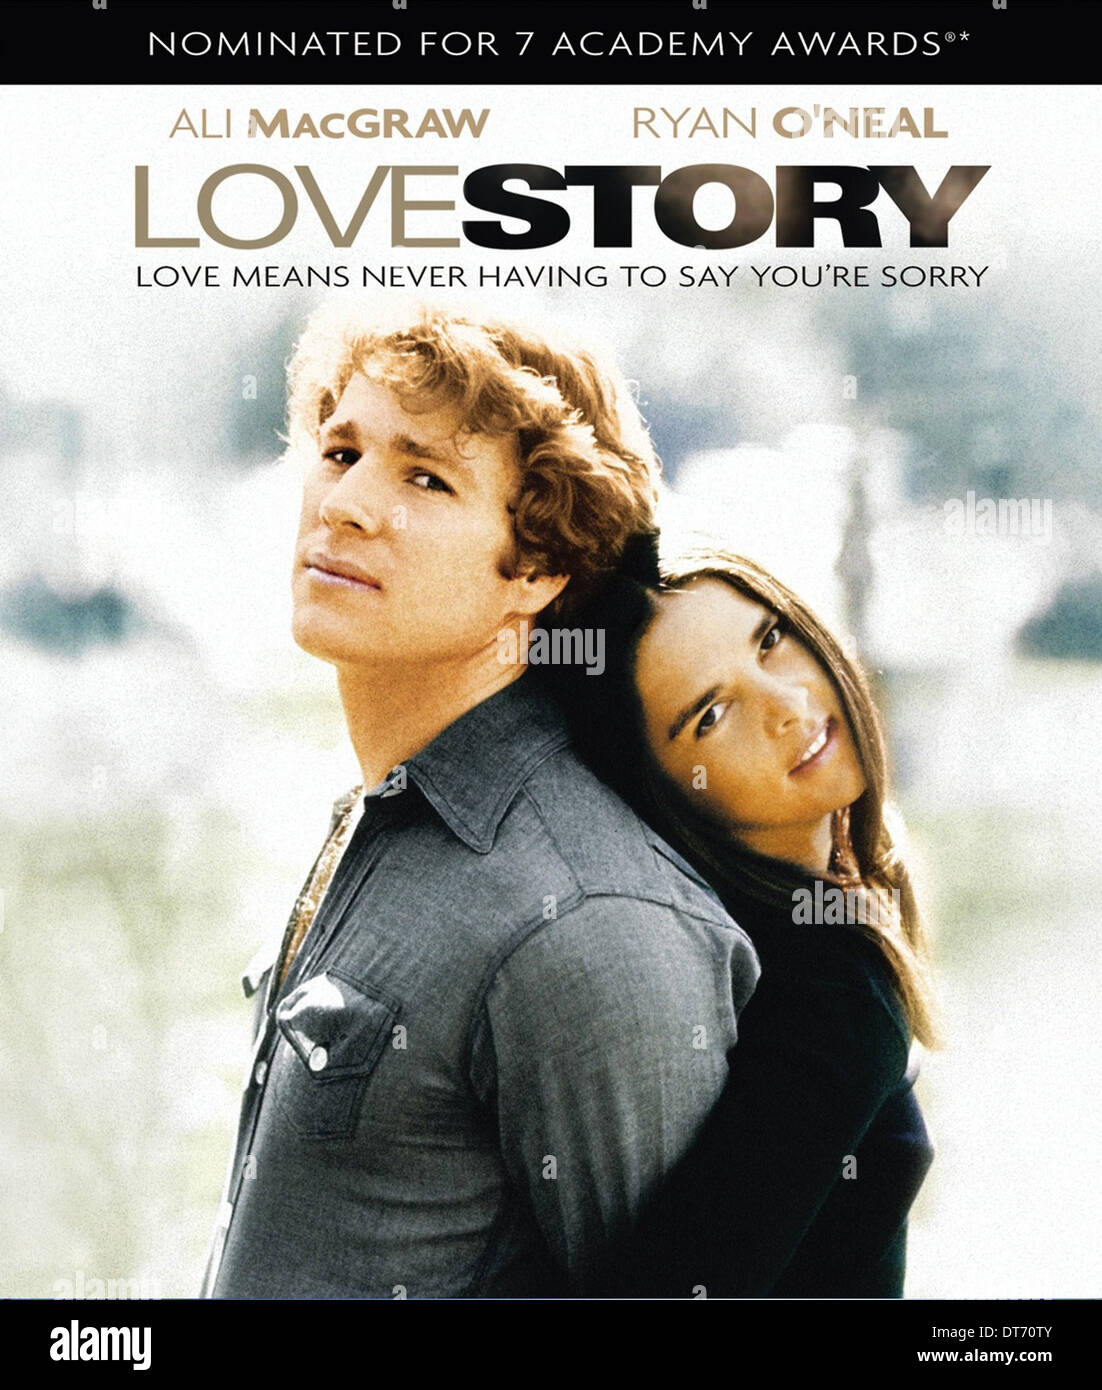 Amazon.com: Love Story 23x32 Movie Poster 1970 Ryan O'Neal ...  Love Story 1970 Poster